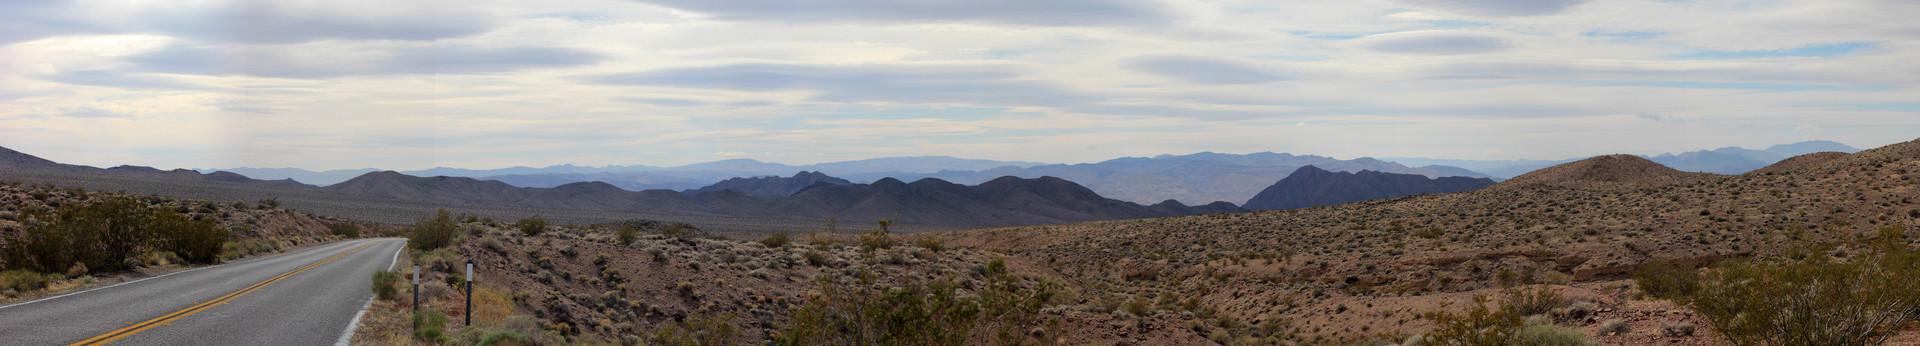 Nevada, California, USA 1